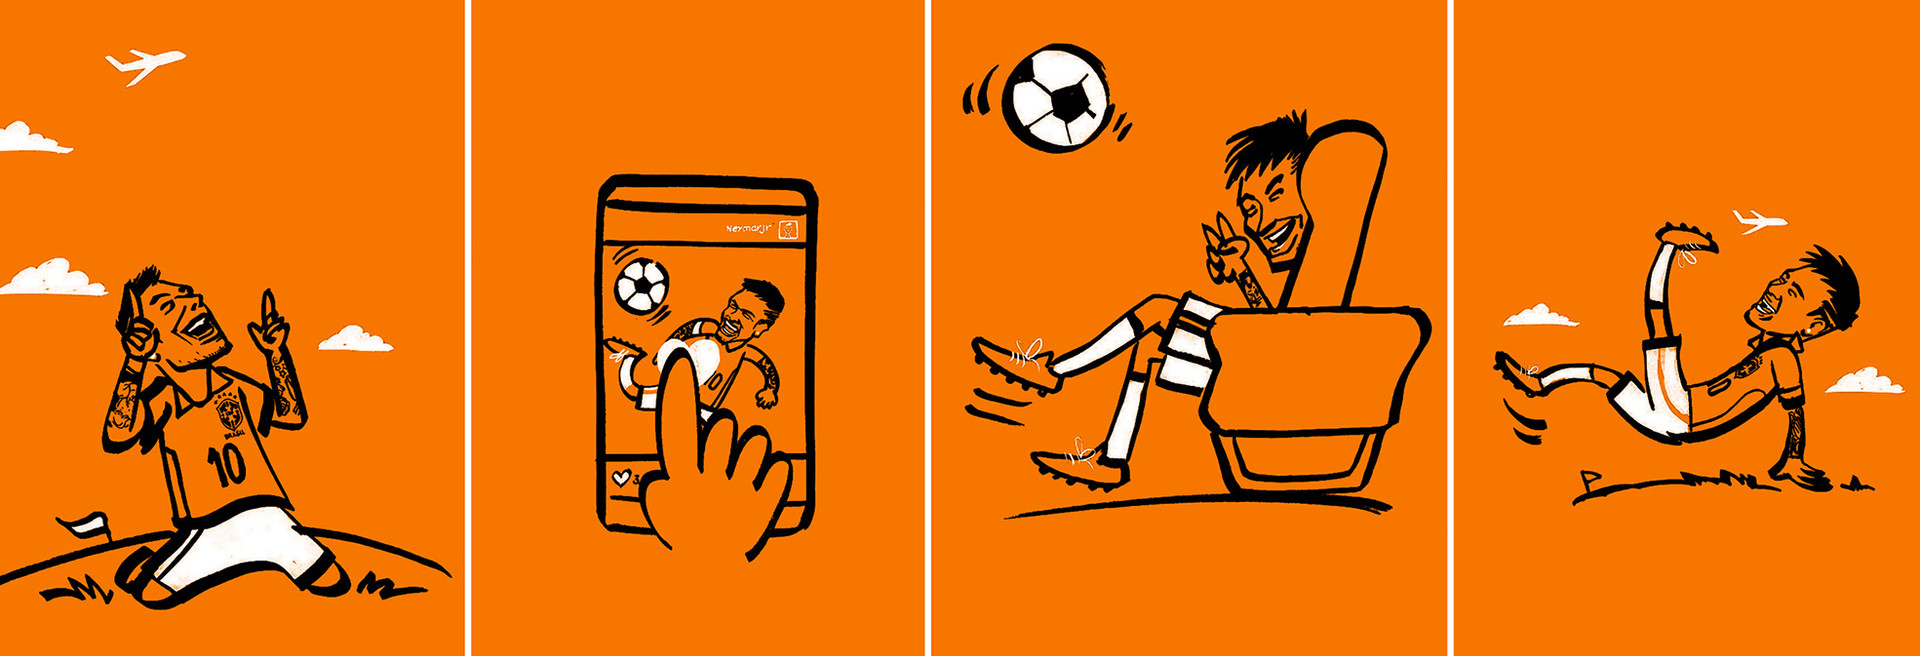 1-gol-neymar-layouts-SITE.jpg